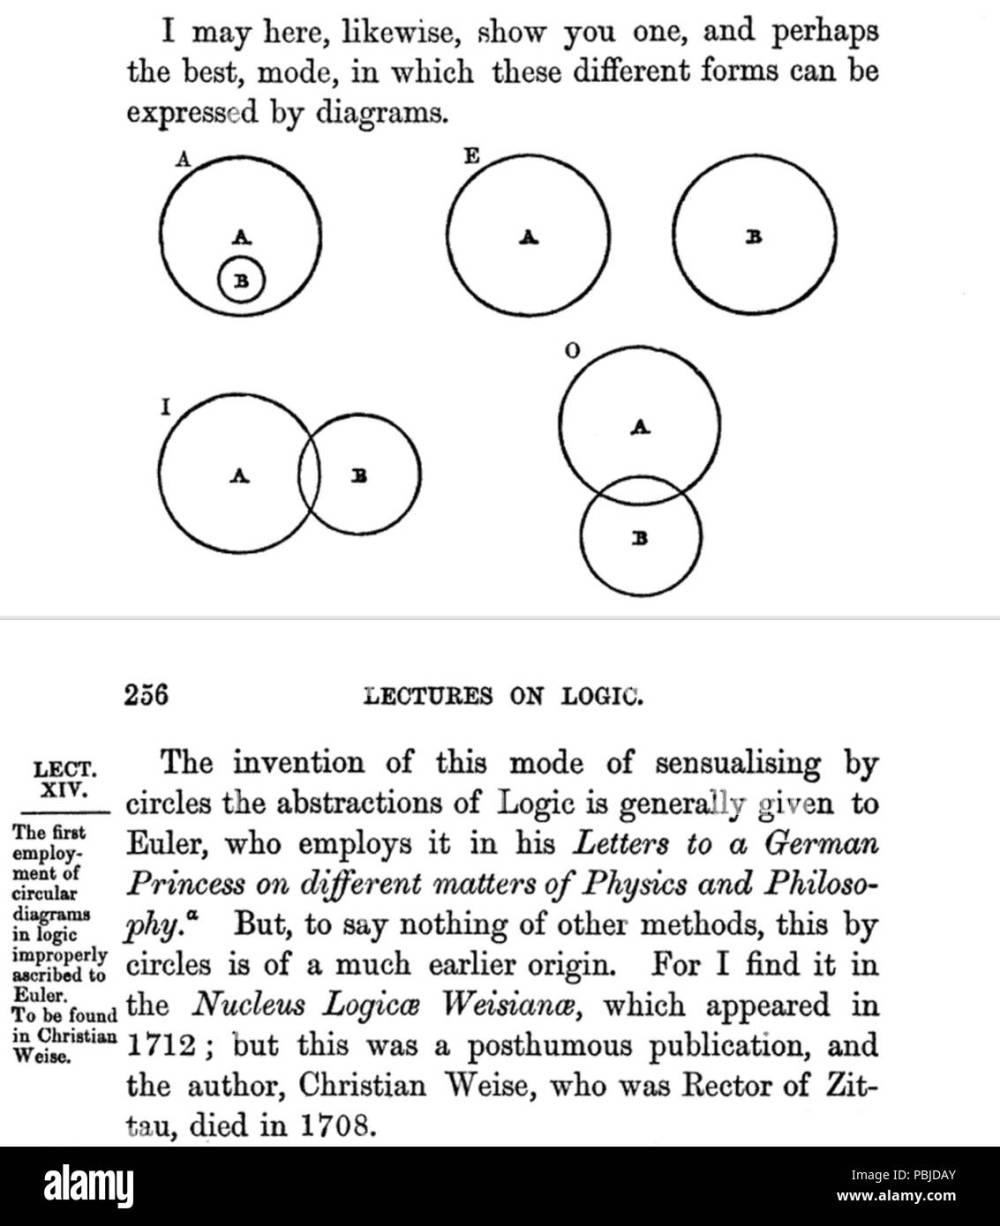 medium resolution of 740 hamilton lectures on logic 1874 euler diagrams